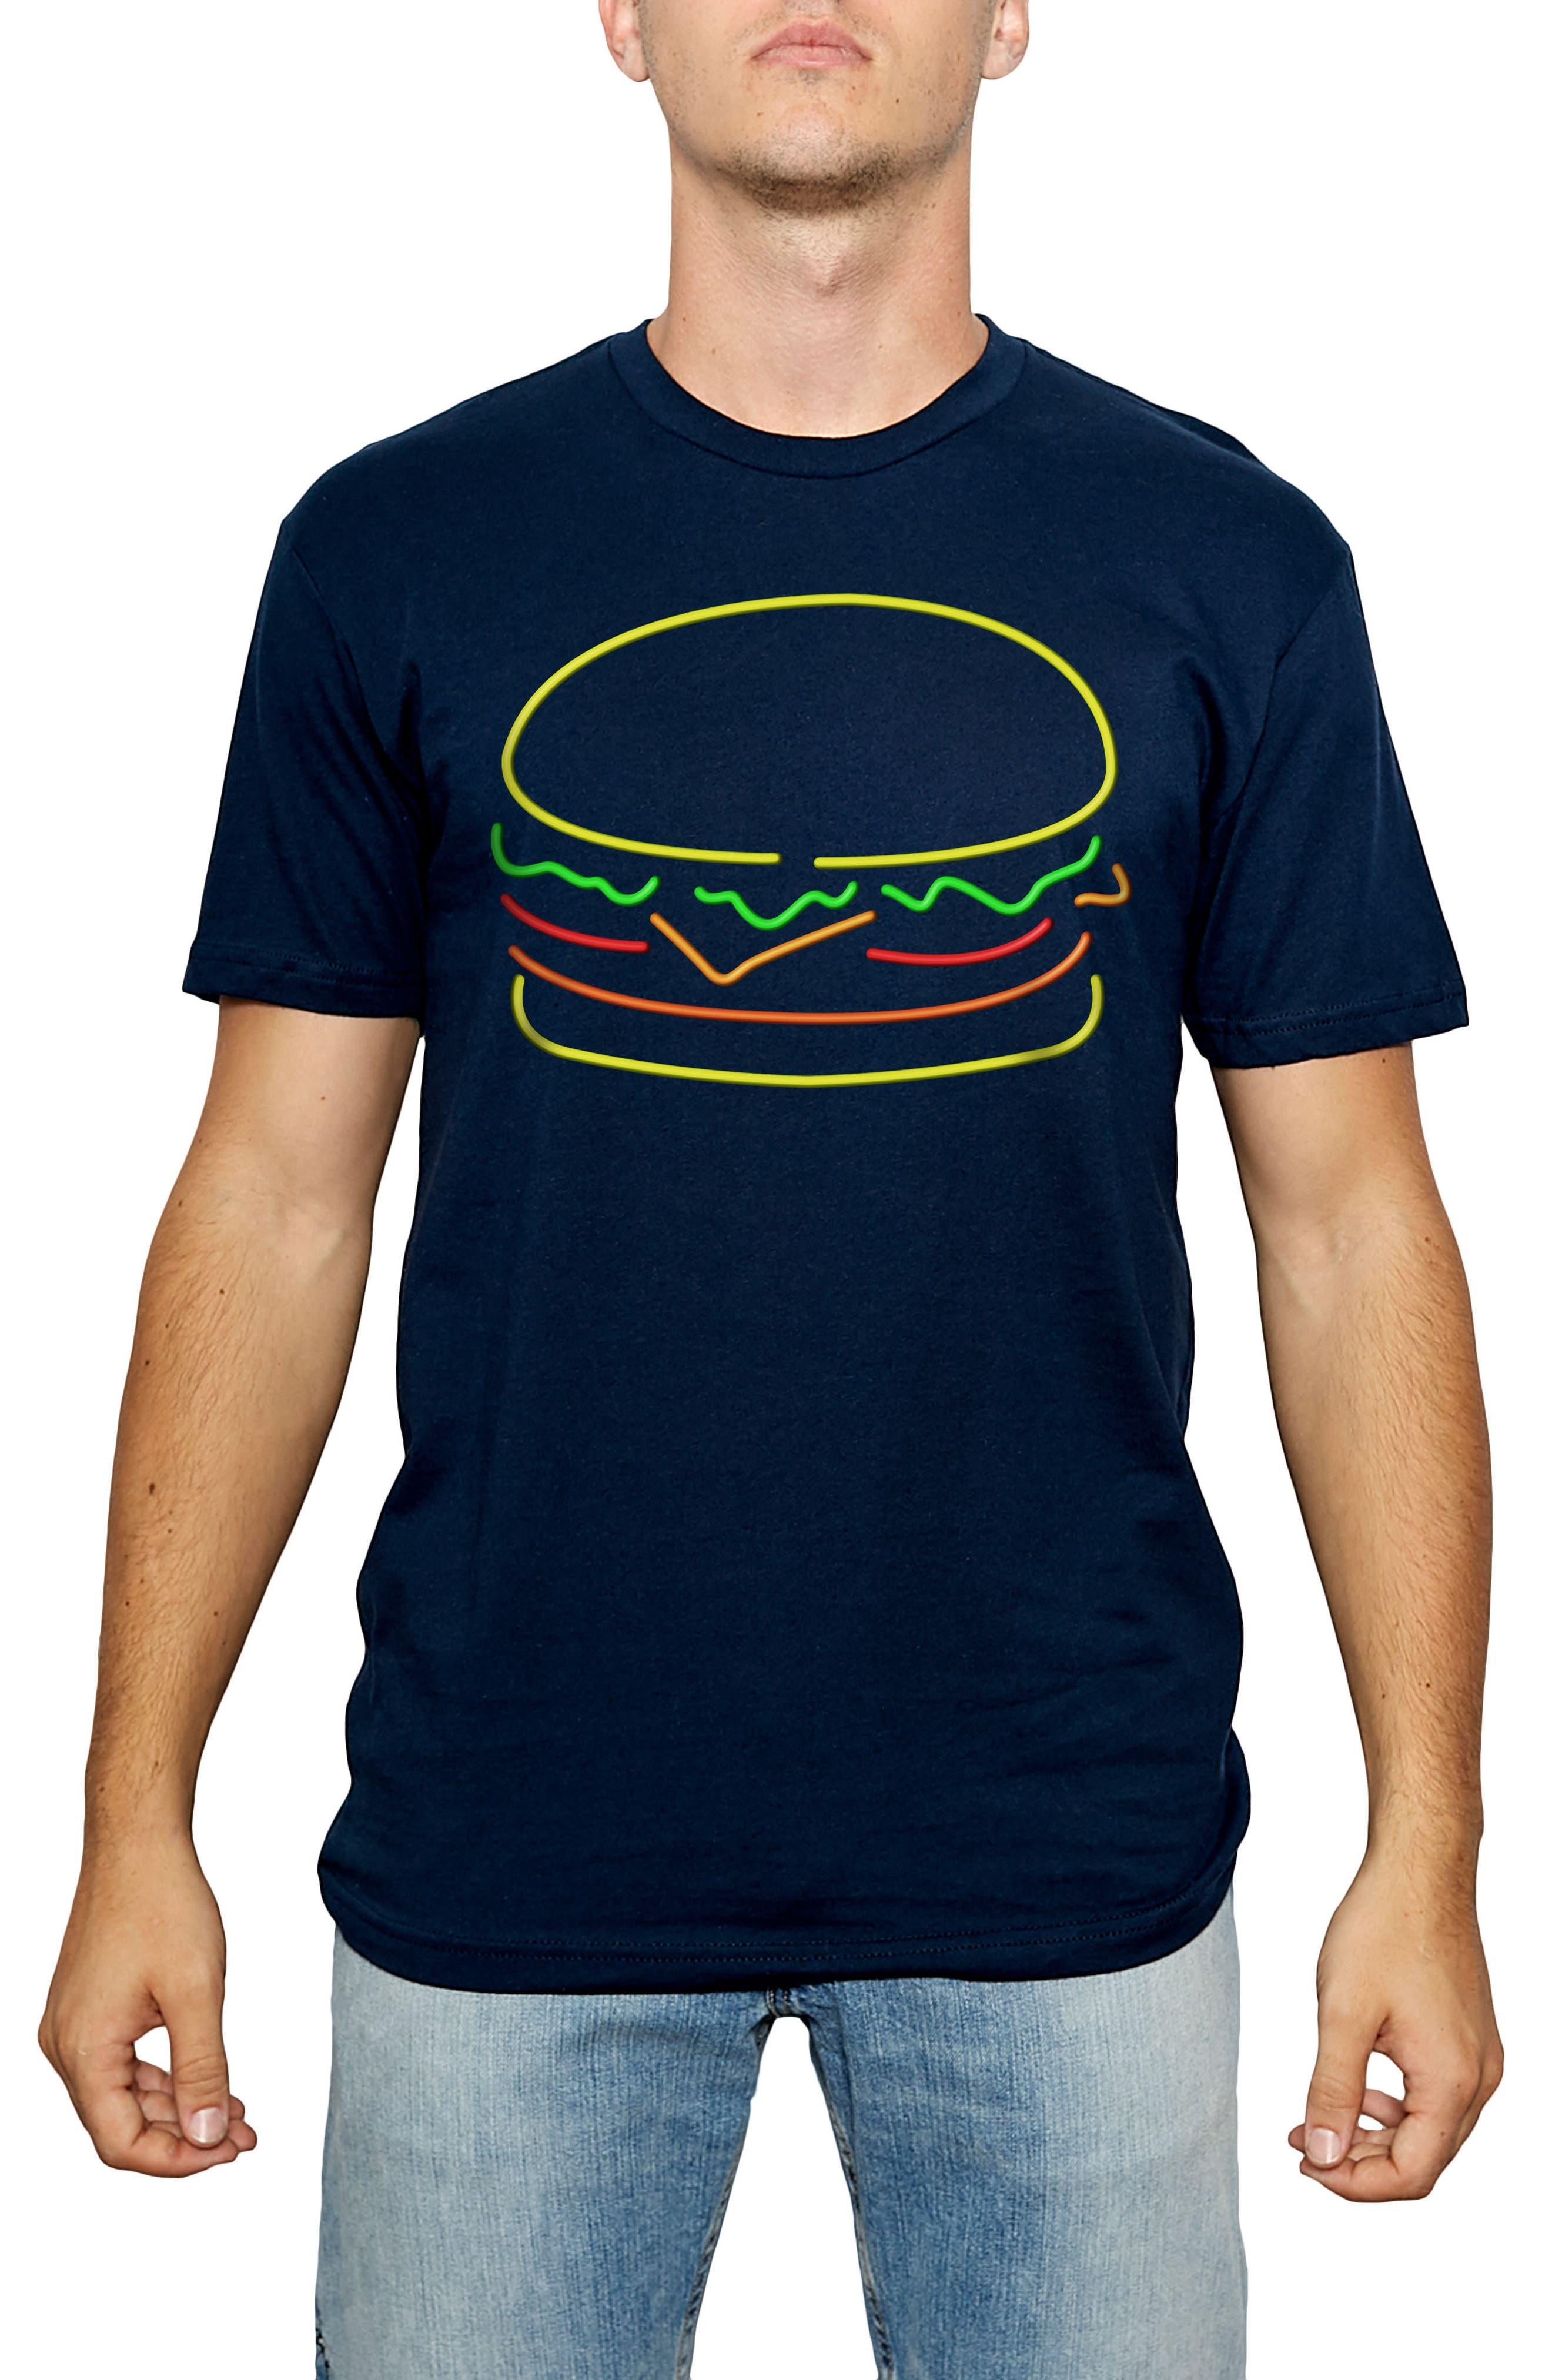 Alternate Image 1 Selected - Kid Dangerous Neon Cheeseburger Graphic T-Shirt